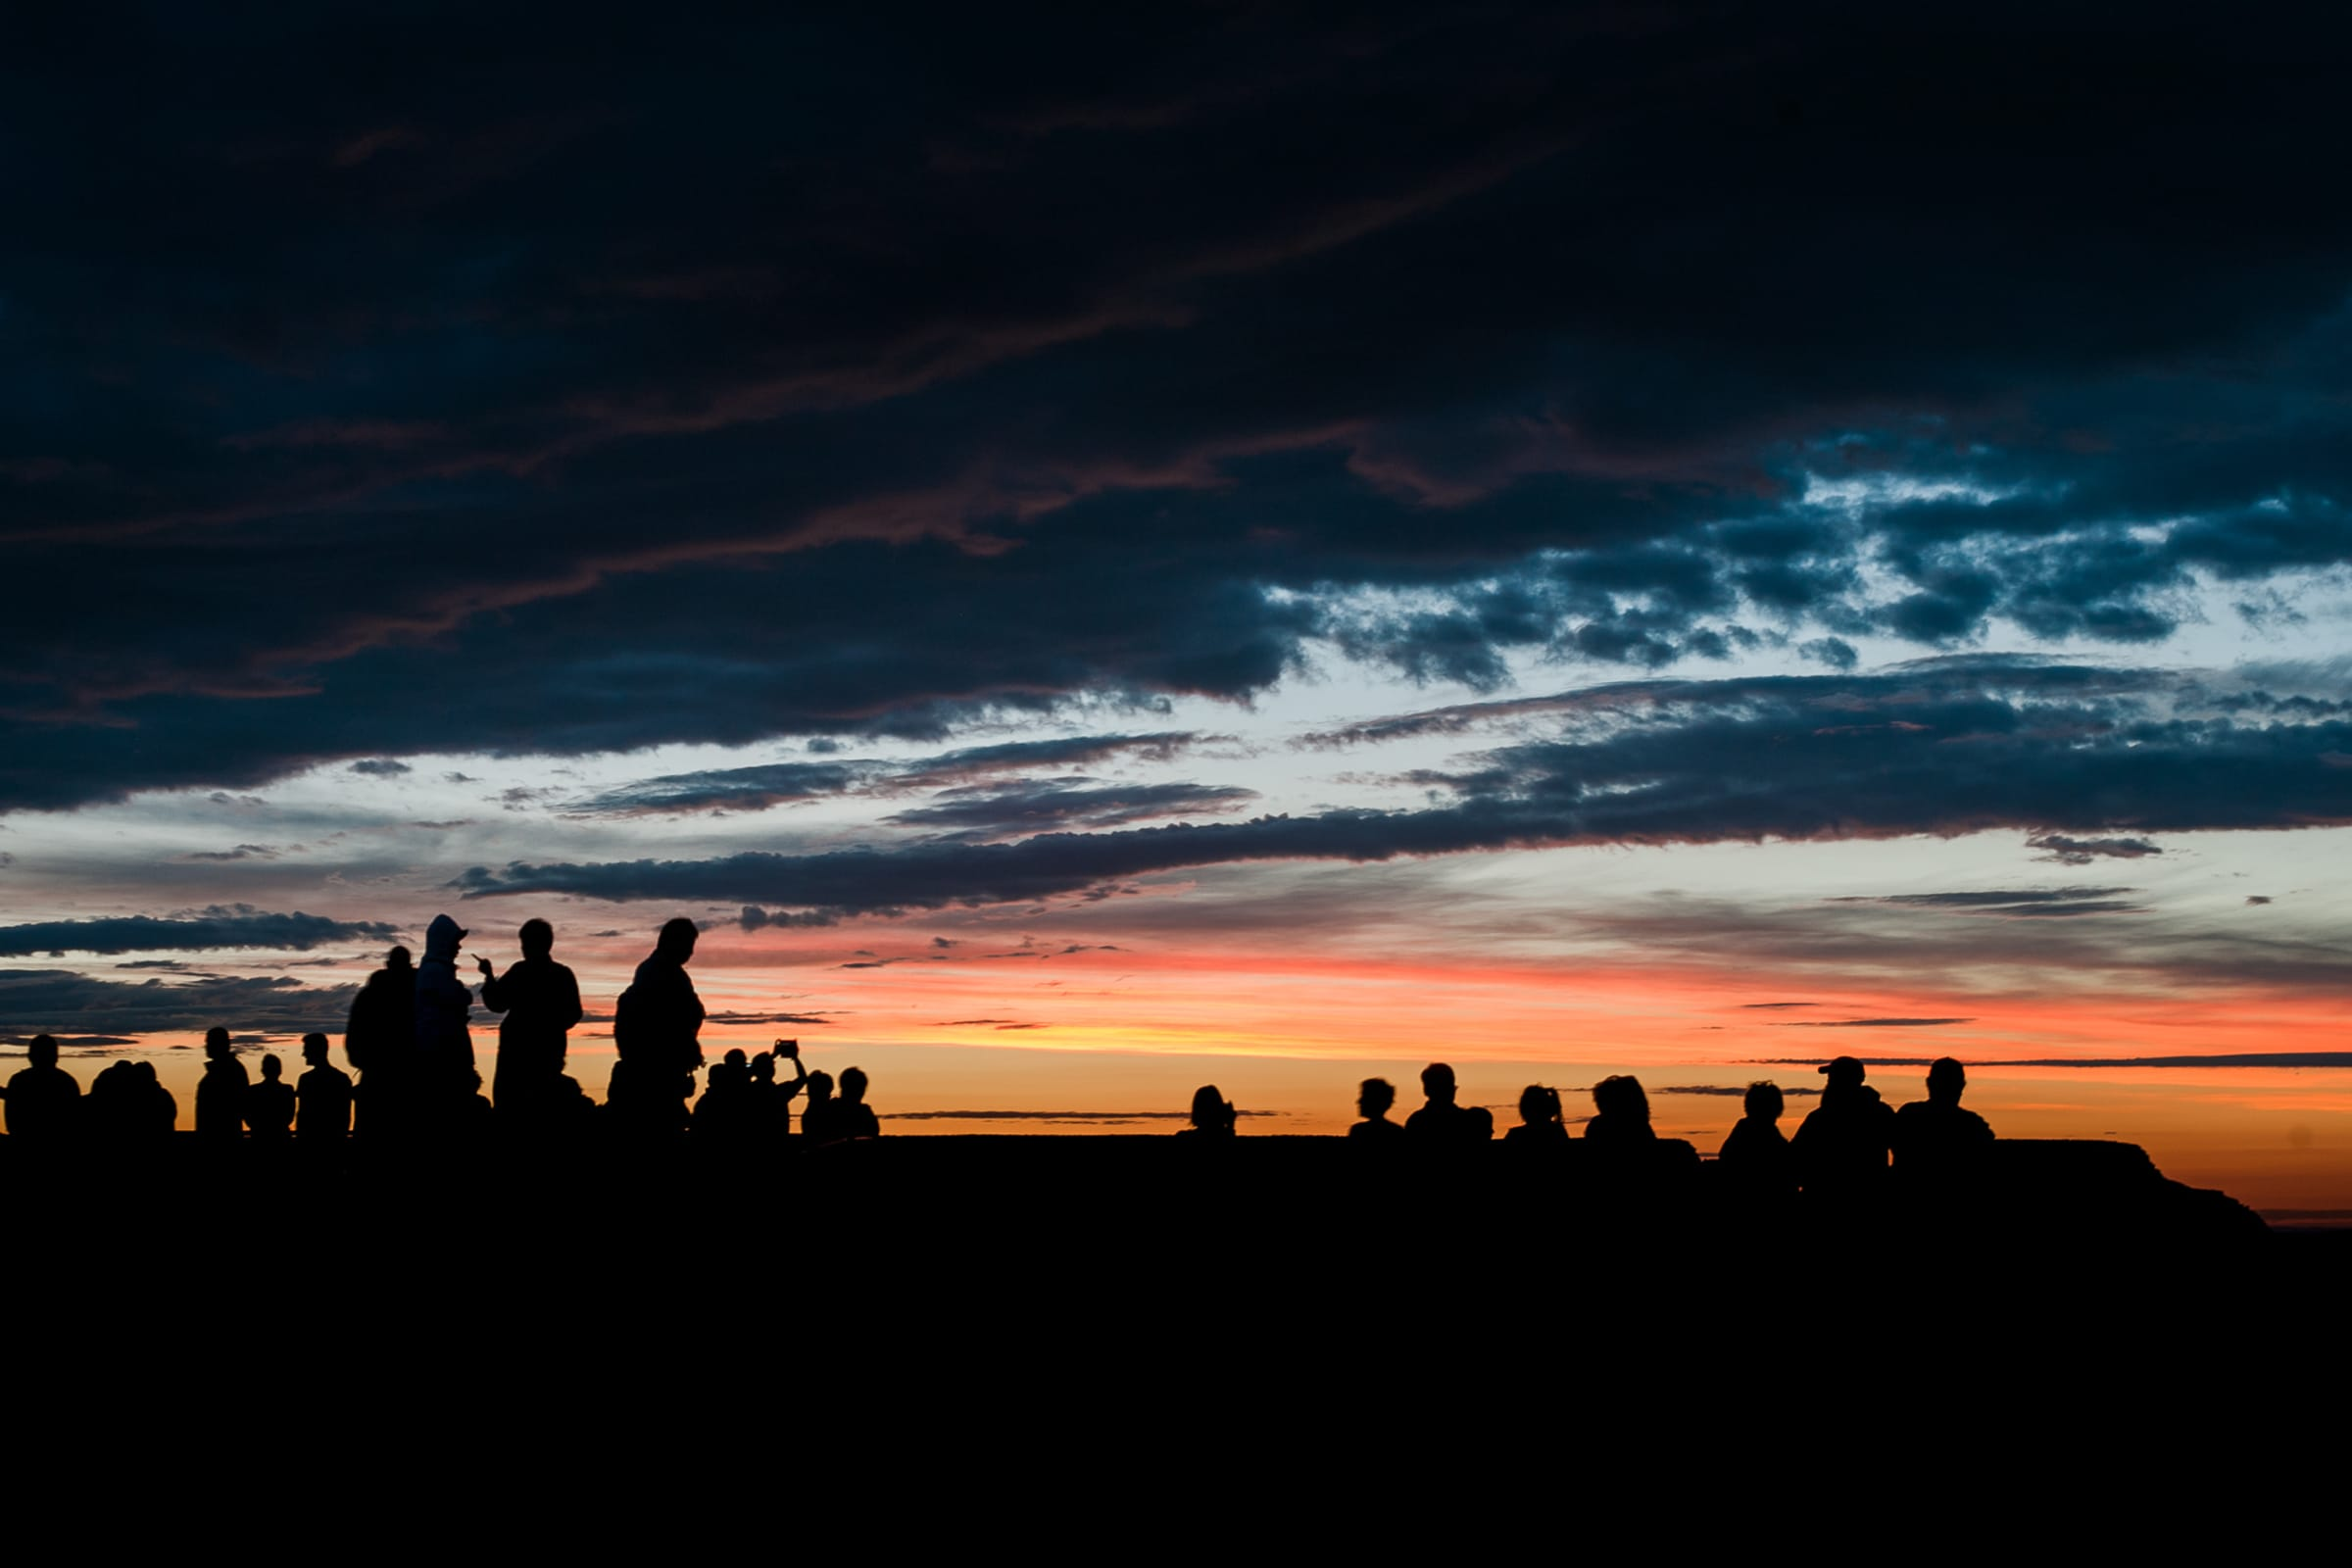 Twilight at Grand Canyon